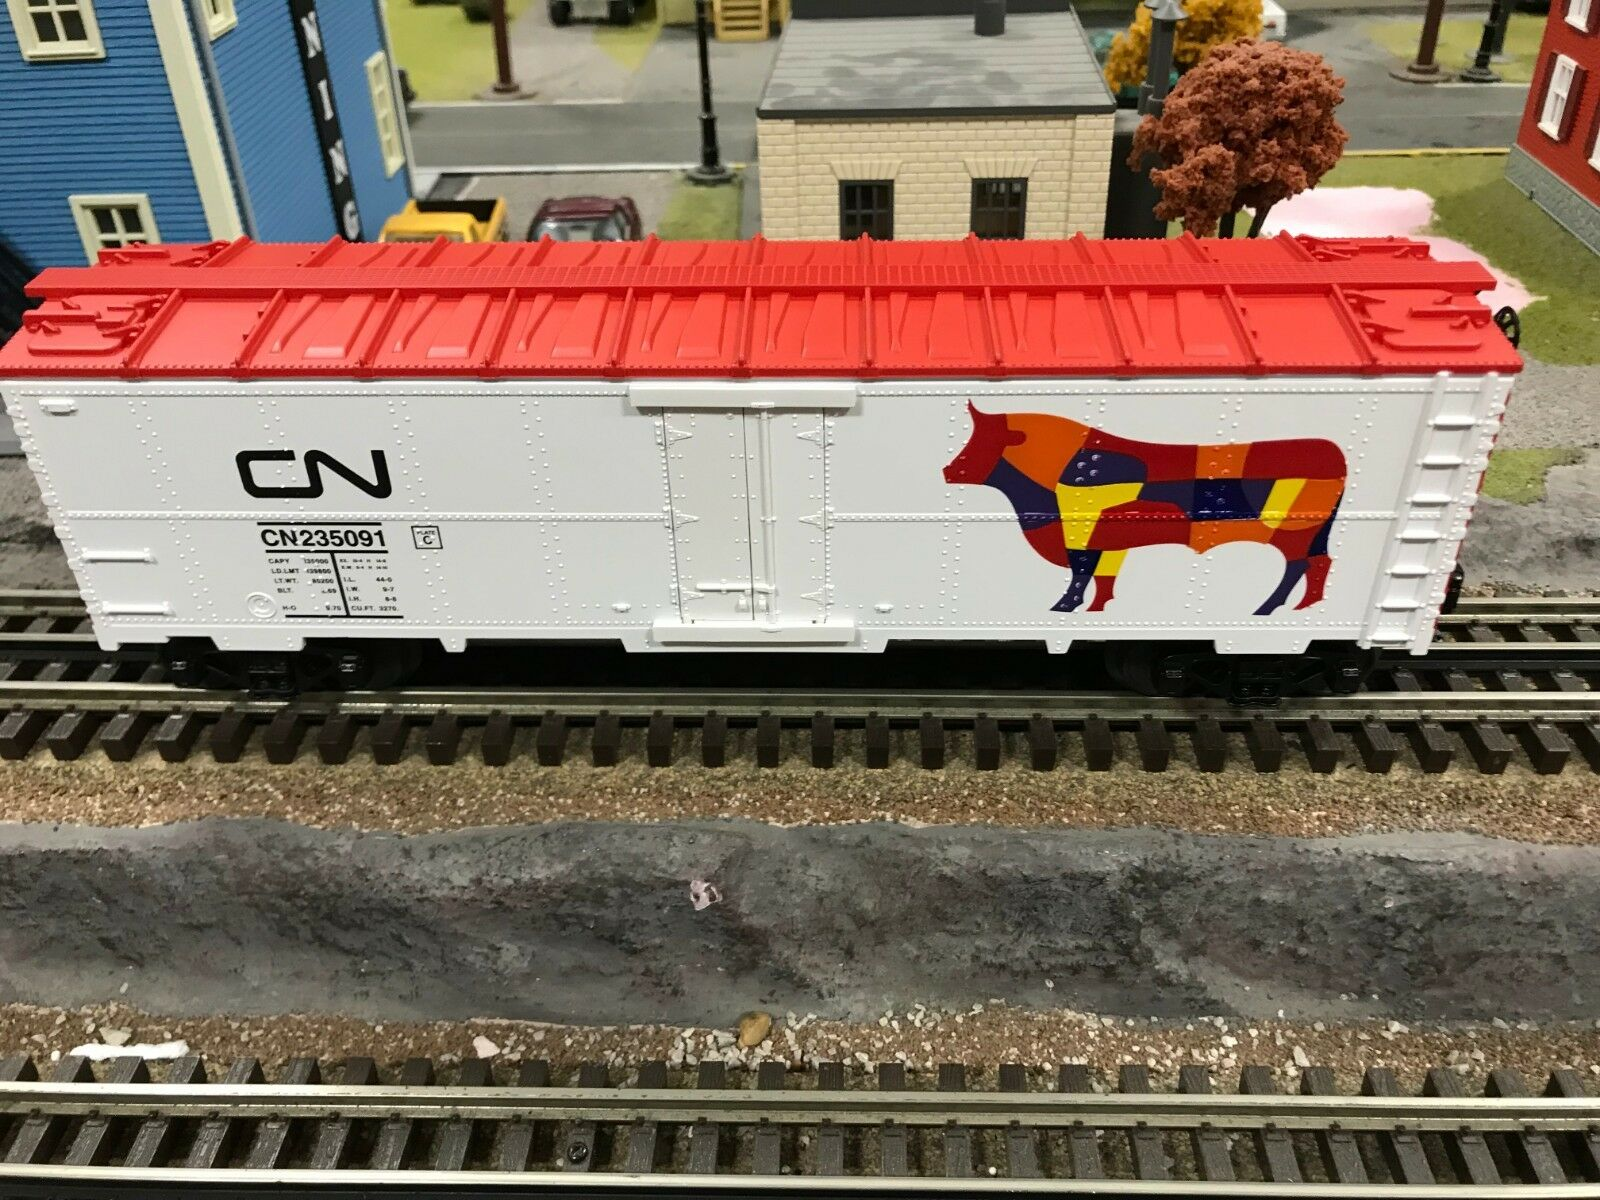 MTH MTH MTH Railking CANADIAN NATIONAL BOXCAR - NIB  b387e6